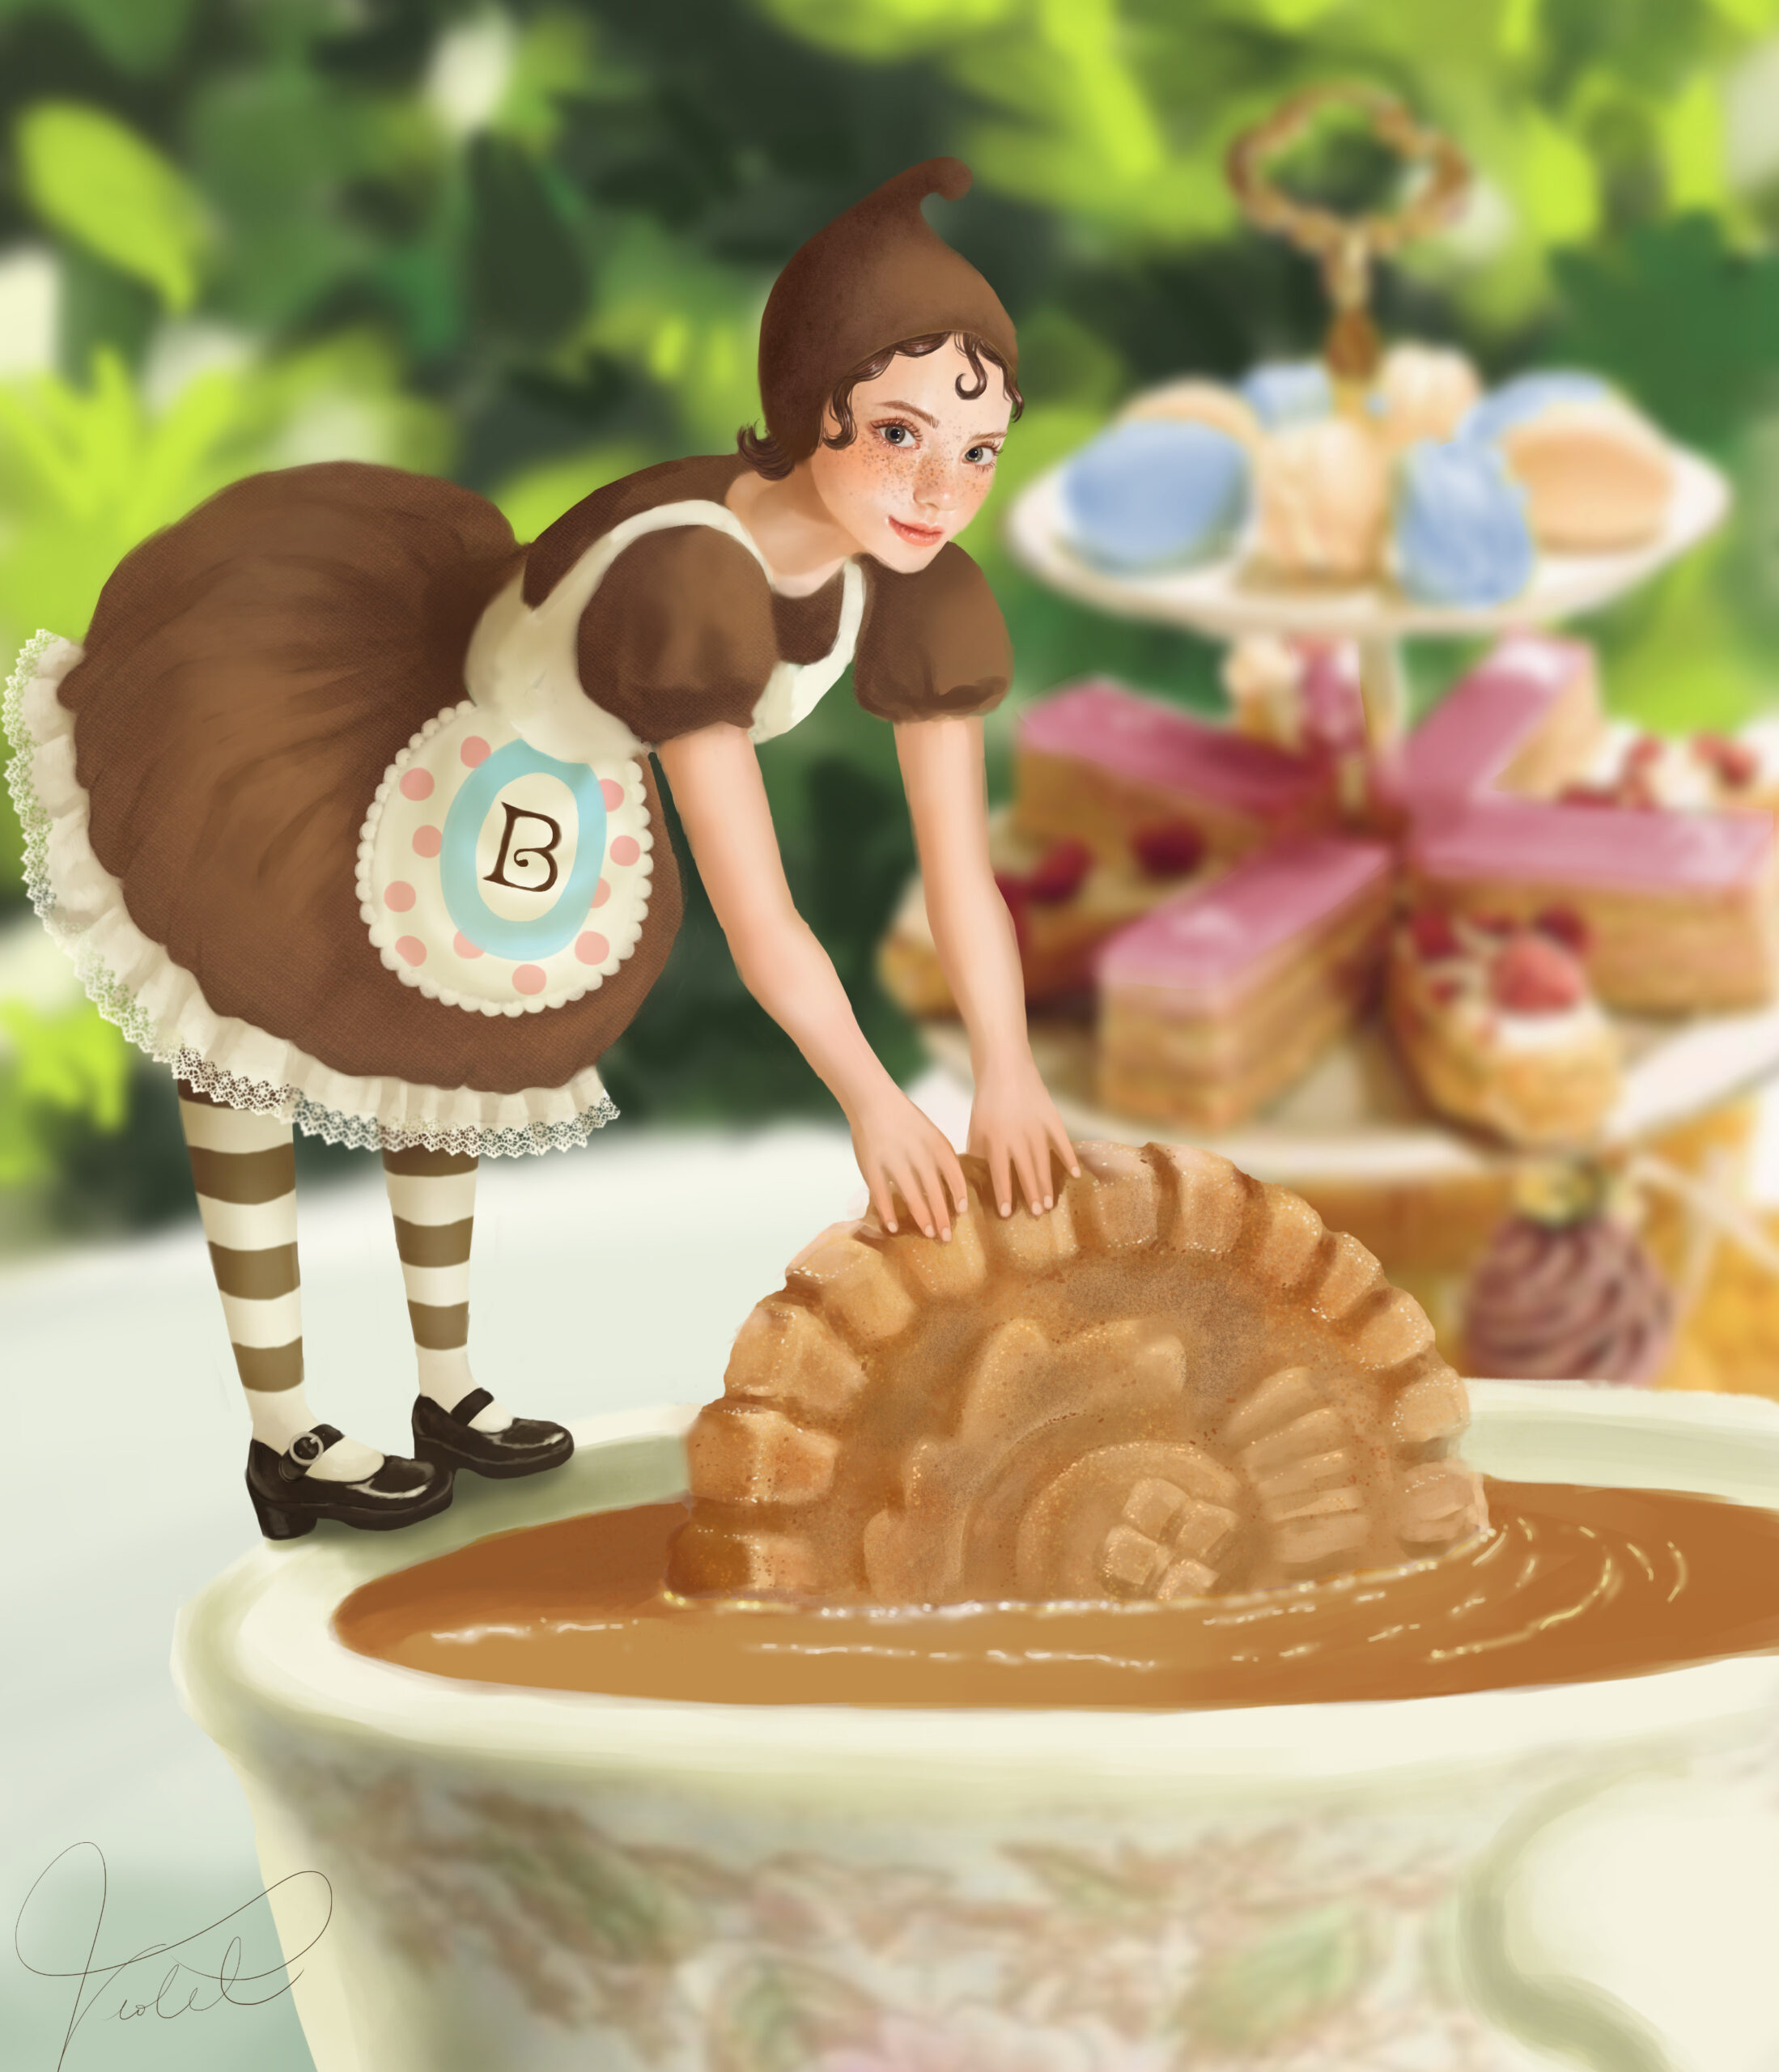 Bea the Brownie